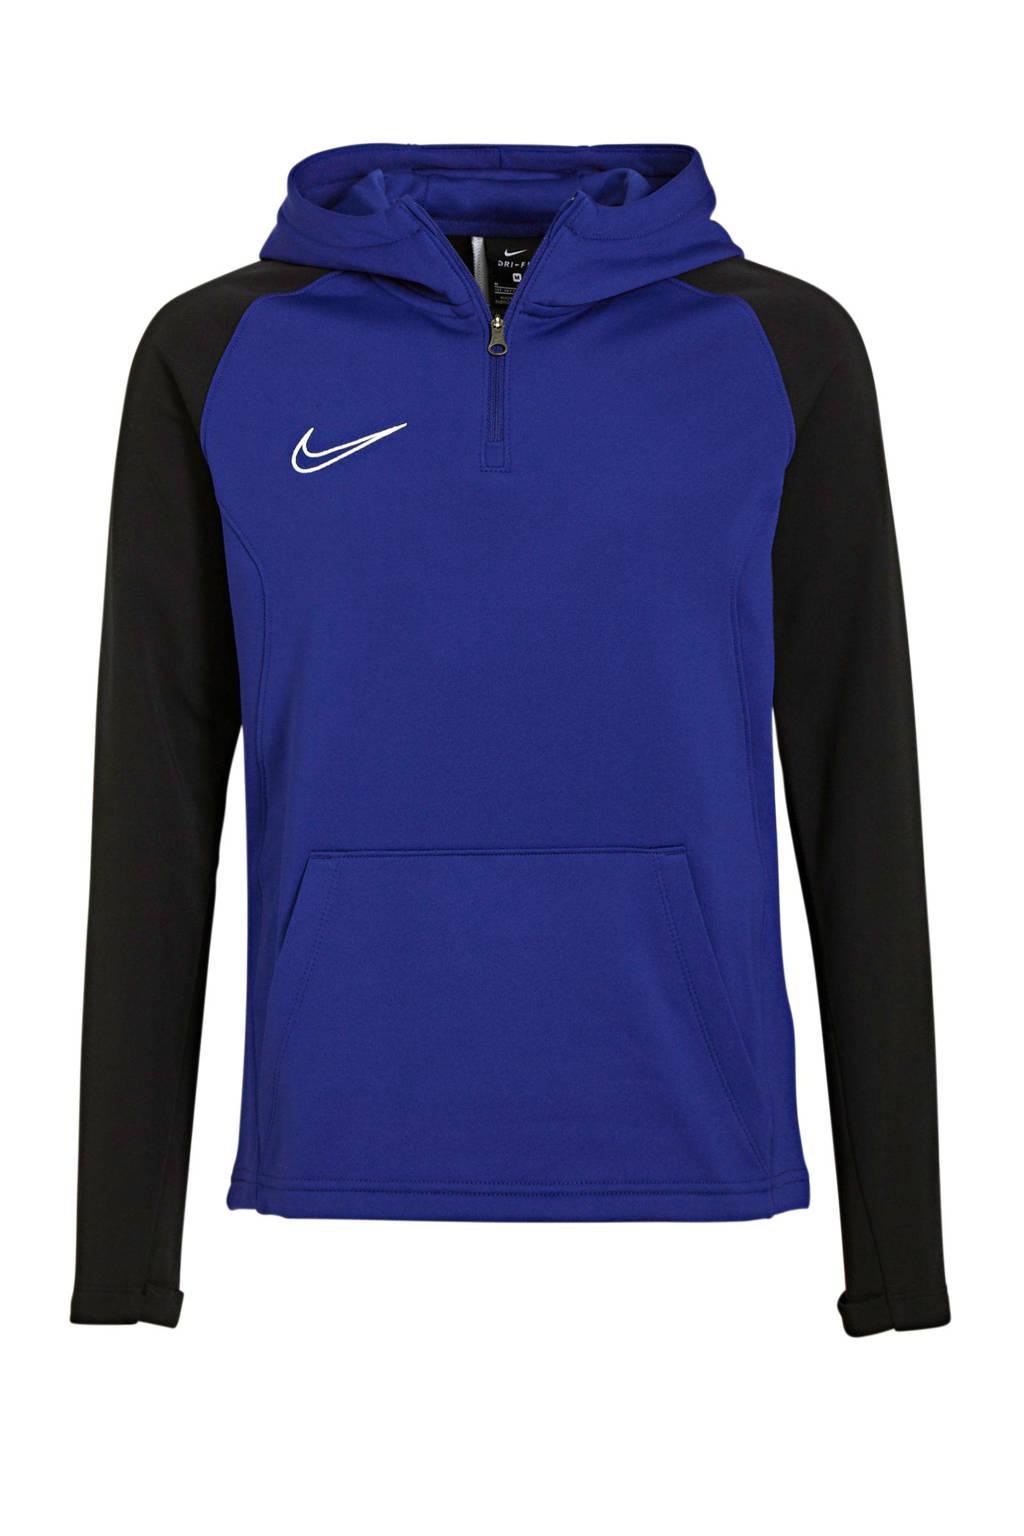 Nike   voetbalsweater zwart/blauw, Zwart/blauw